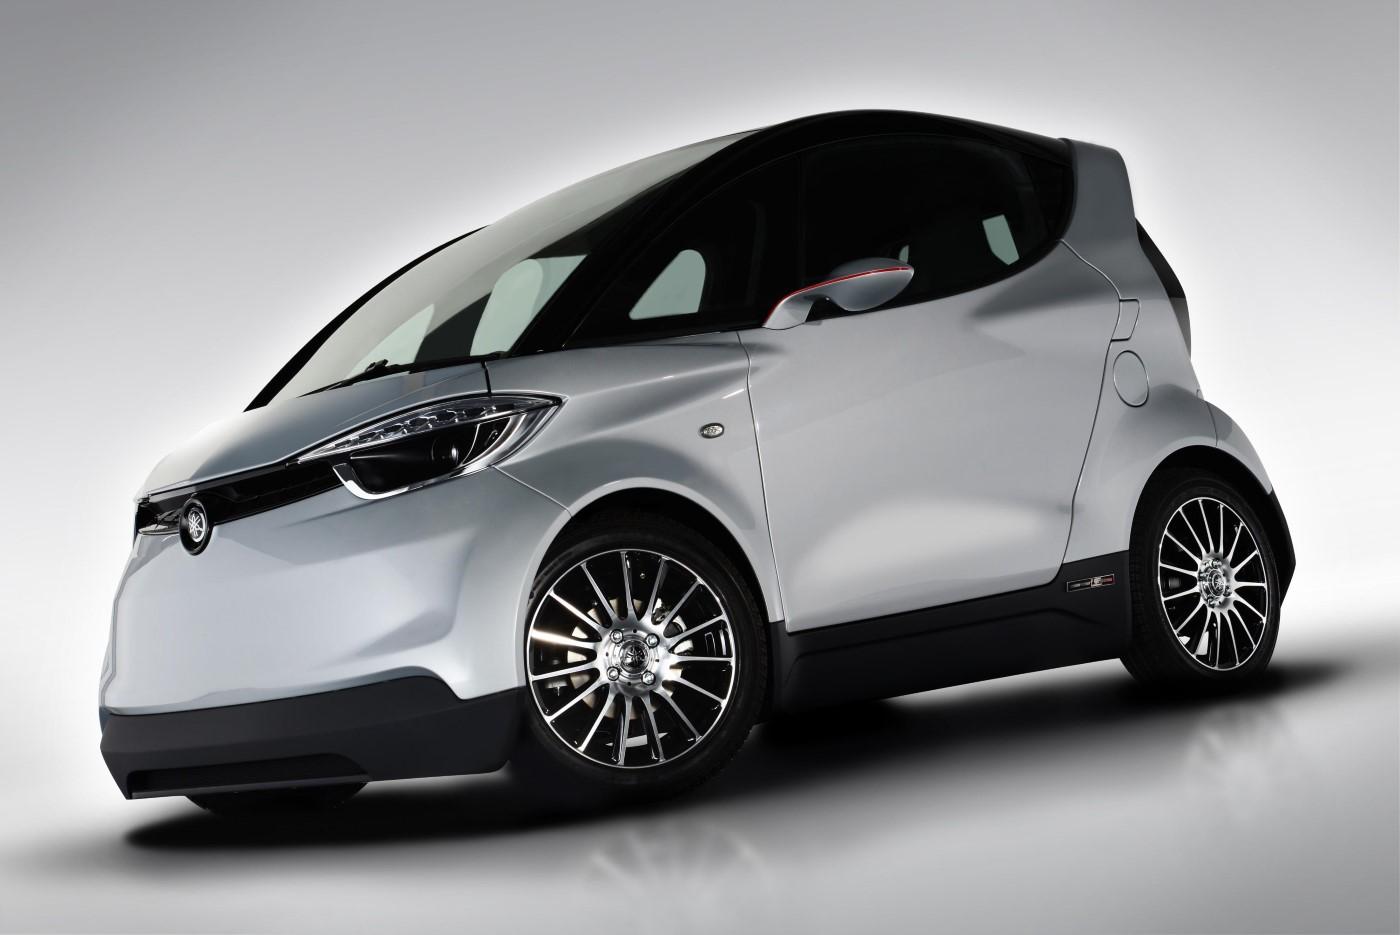 Gordon Murray-Designed Yamaha Minicar Car Gets Zytek Electric Power